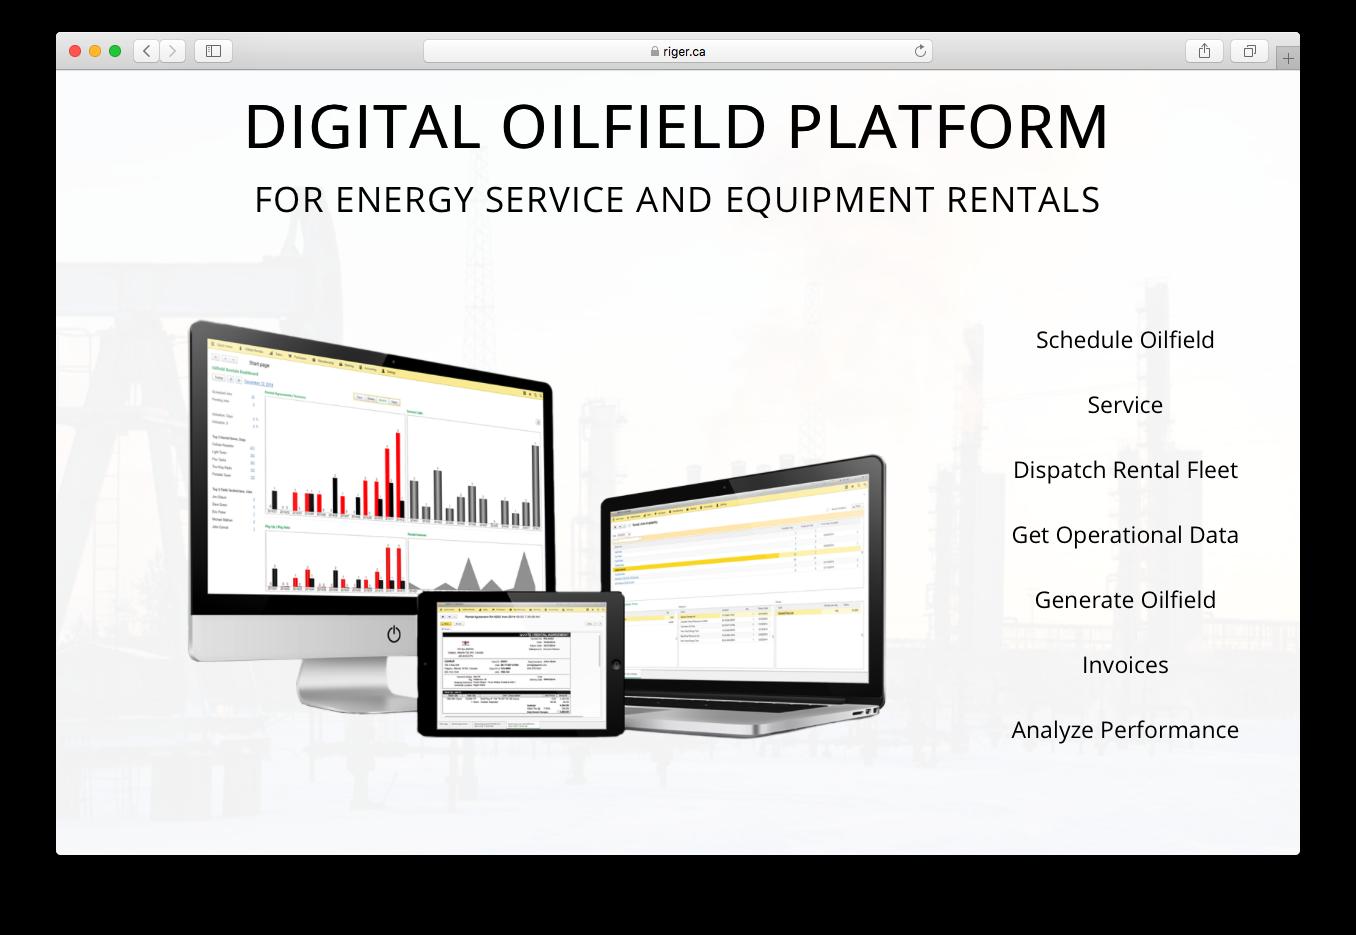 RigER digital oilfield platform energy service equipment rentals